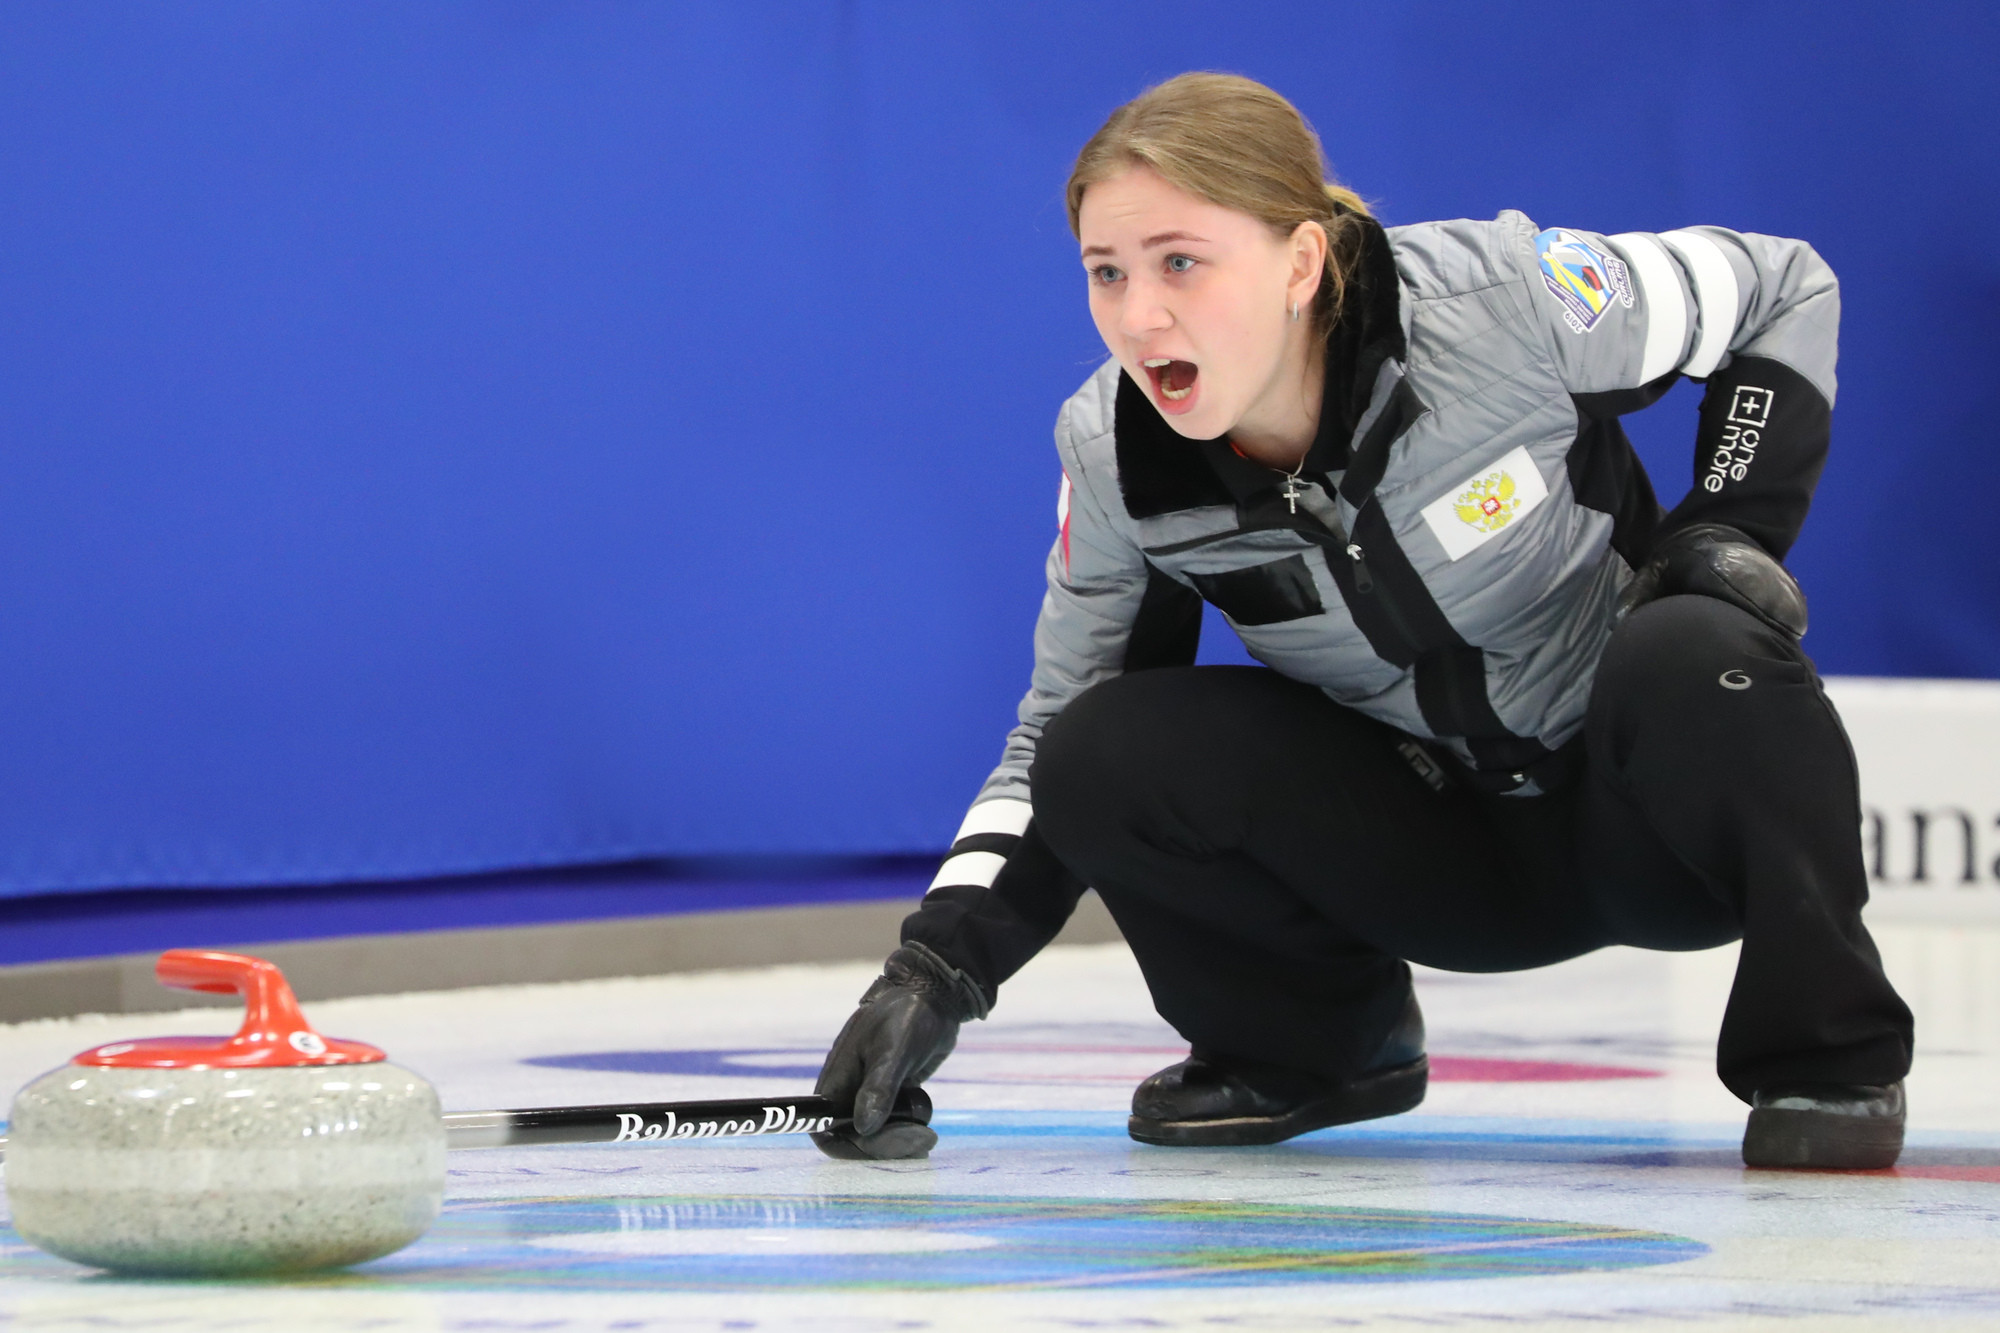 World Junior Curling Championships return to Russia